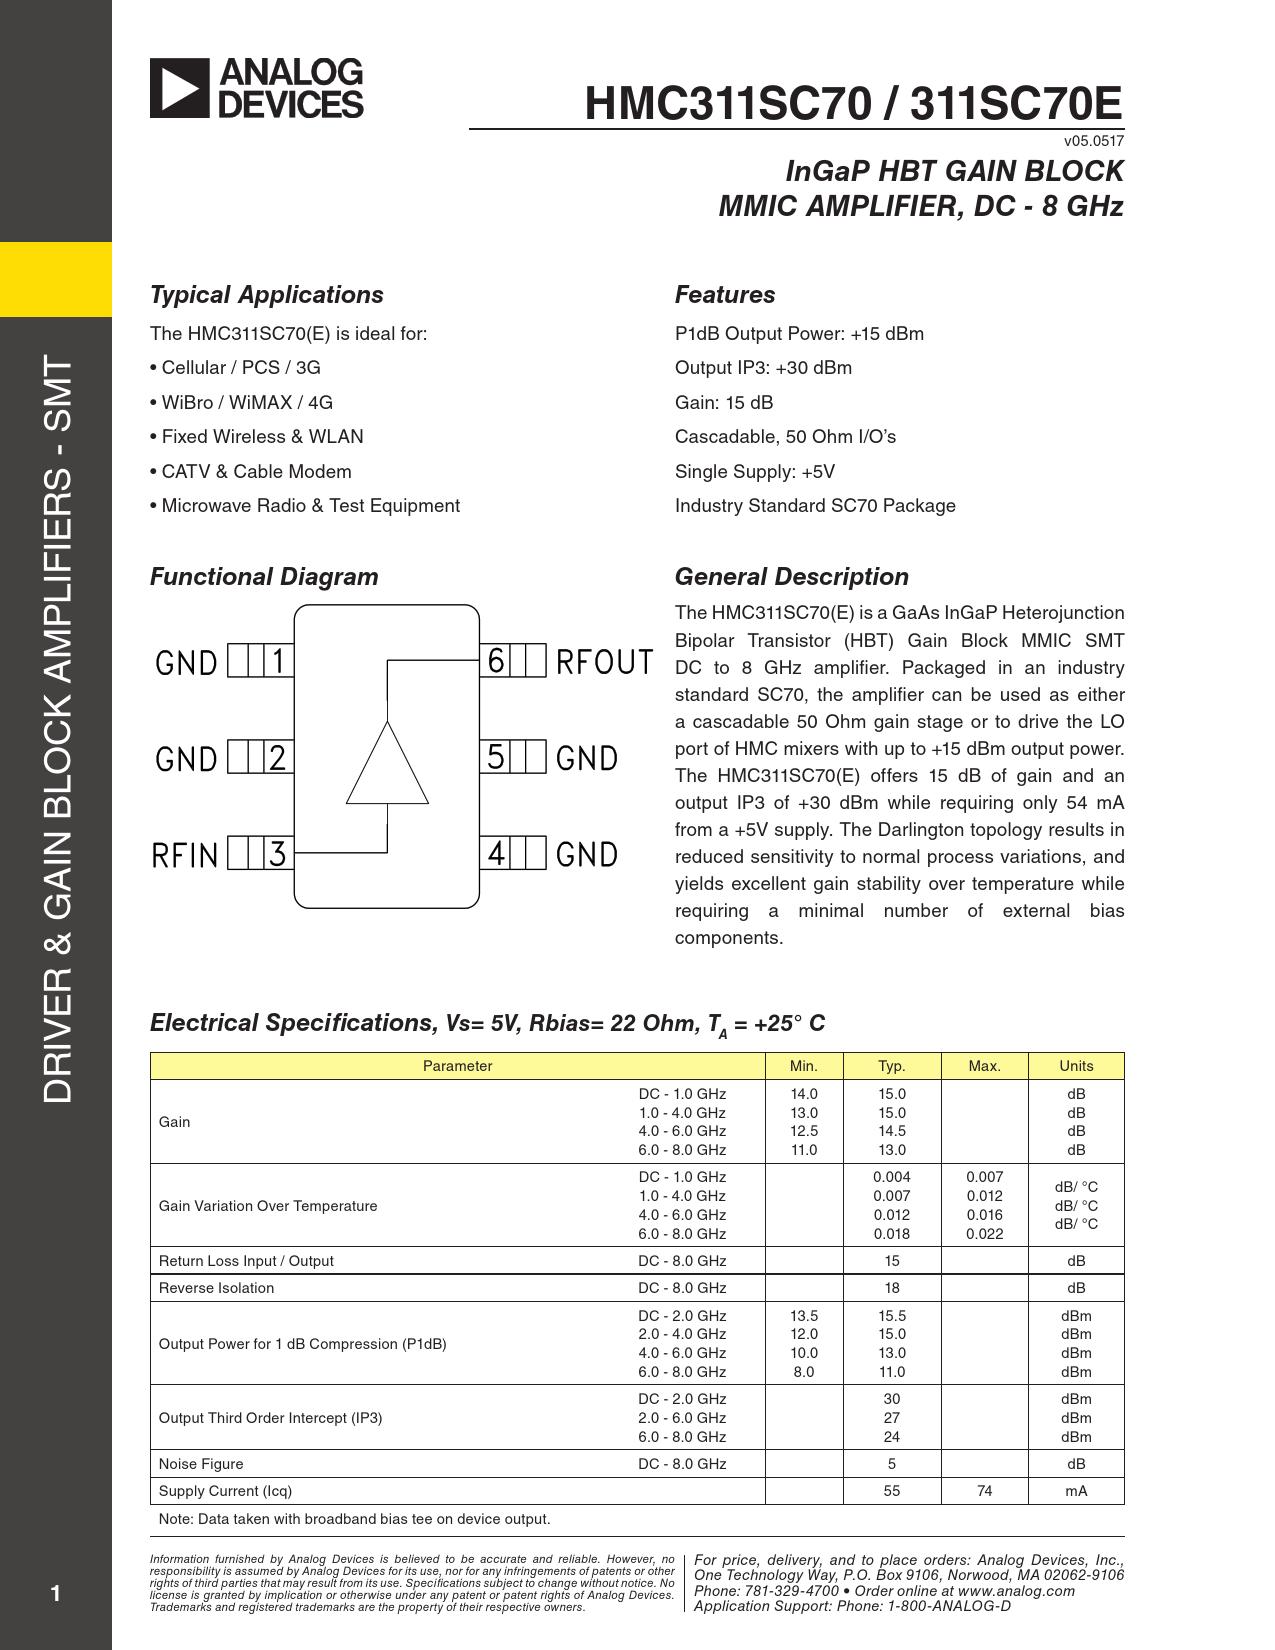 Datasheet HMC311SC70 / 311SC70E Analog Devices